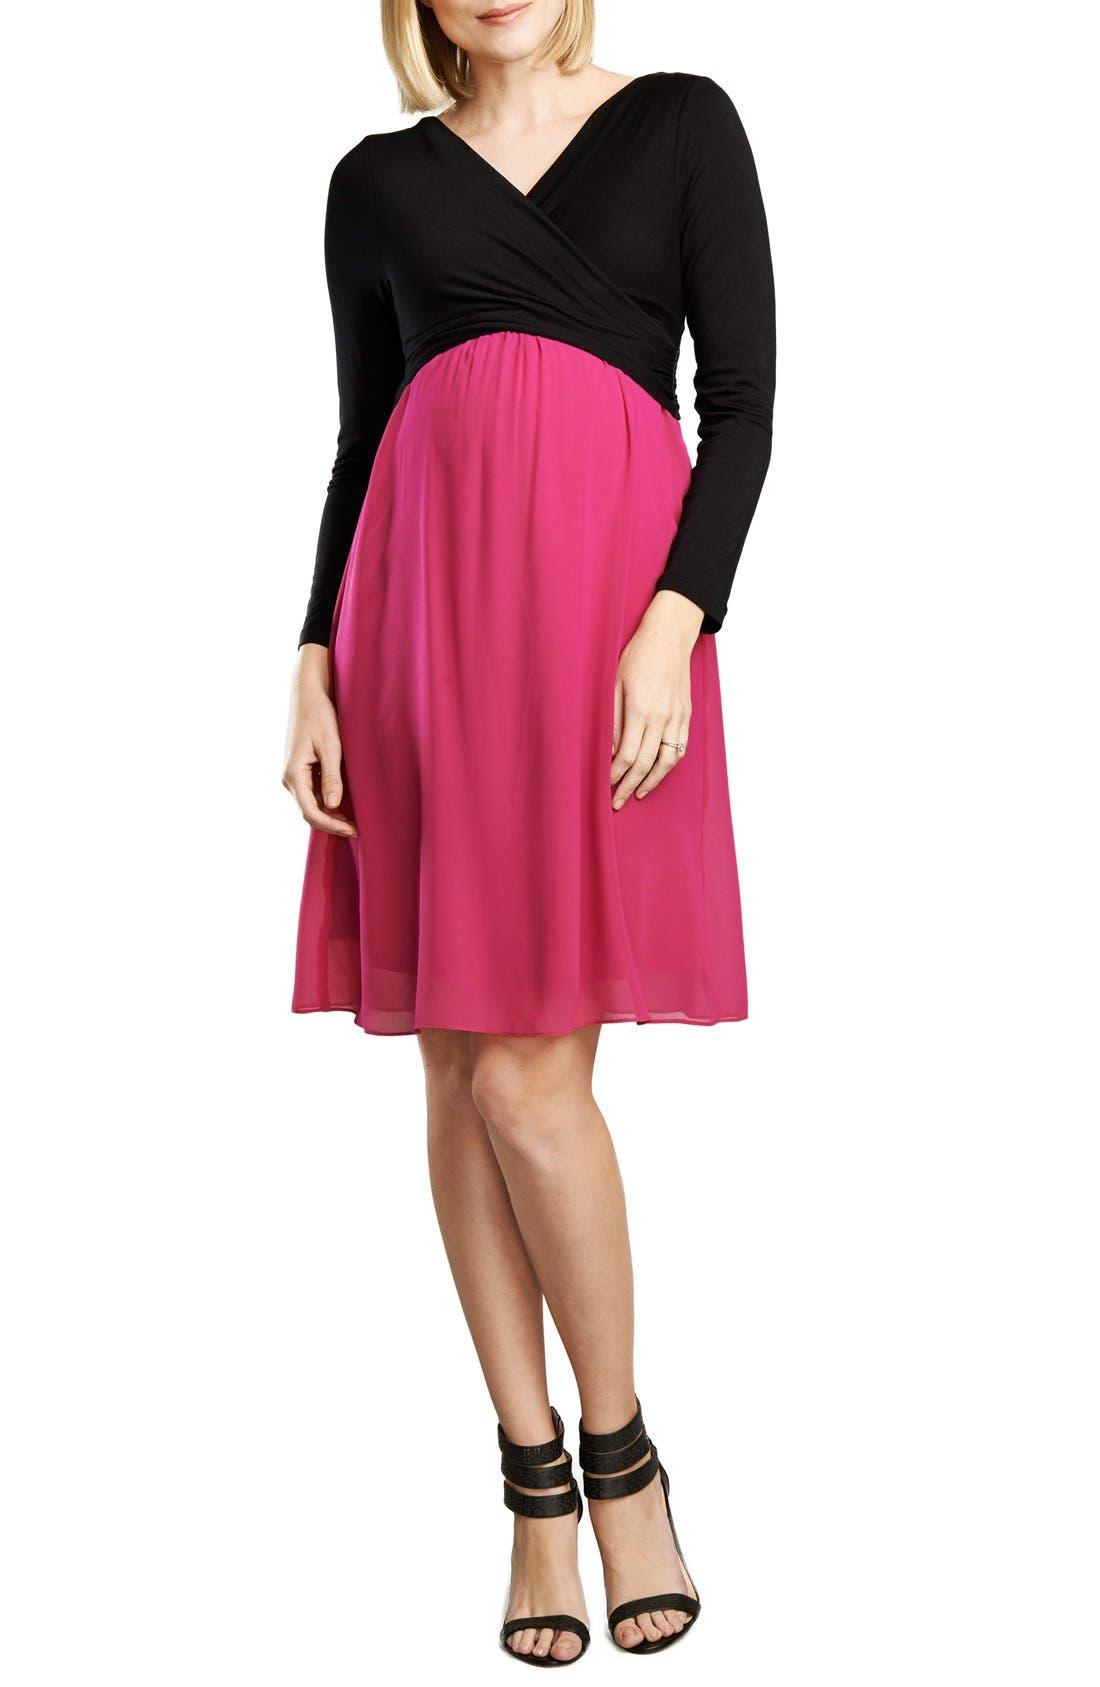 Crossover Maternity Dress,                         Main,                         color, Fuschia/Black